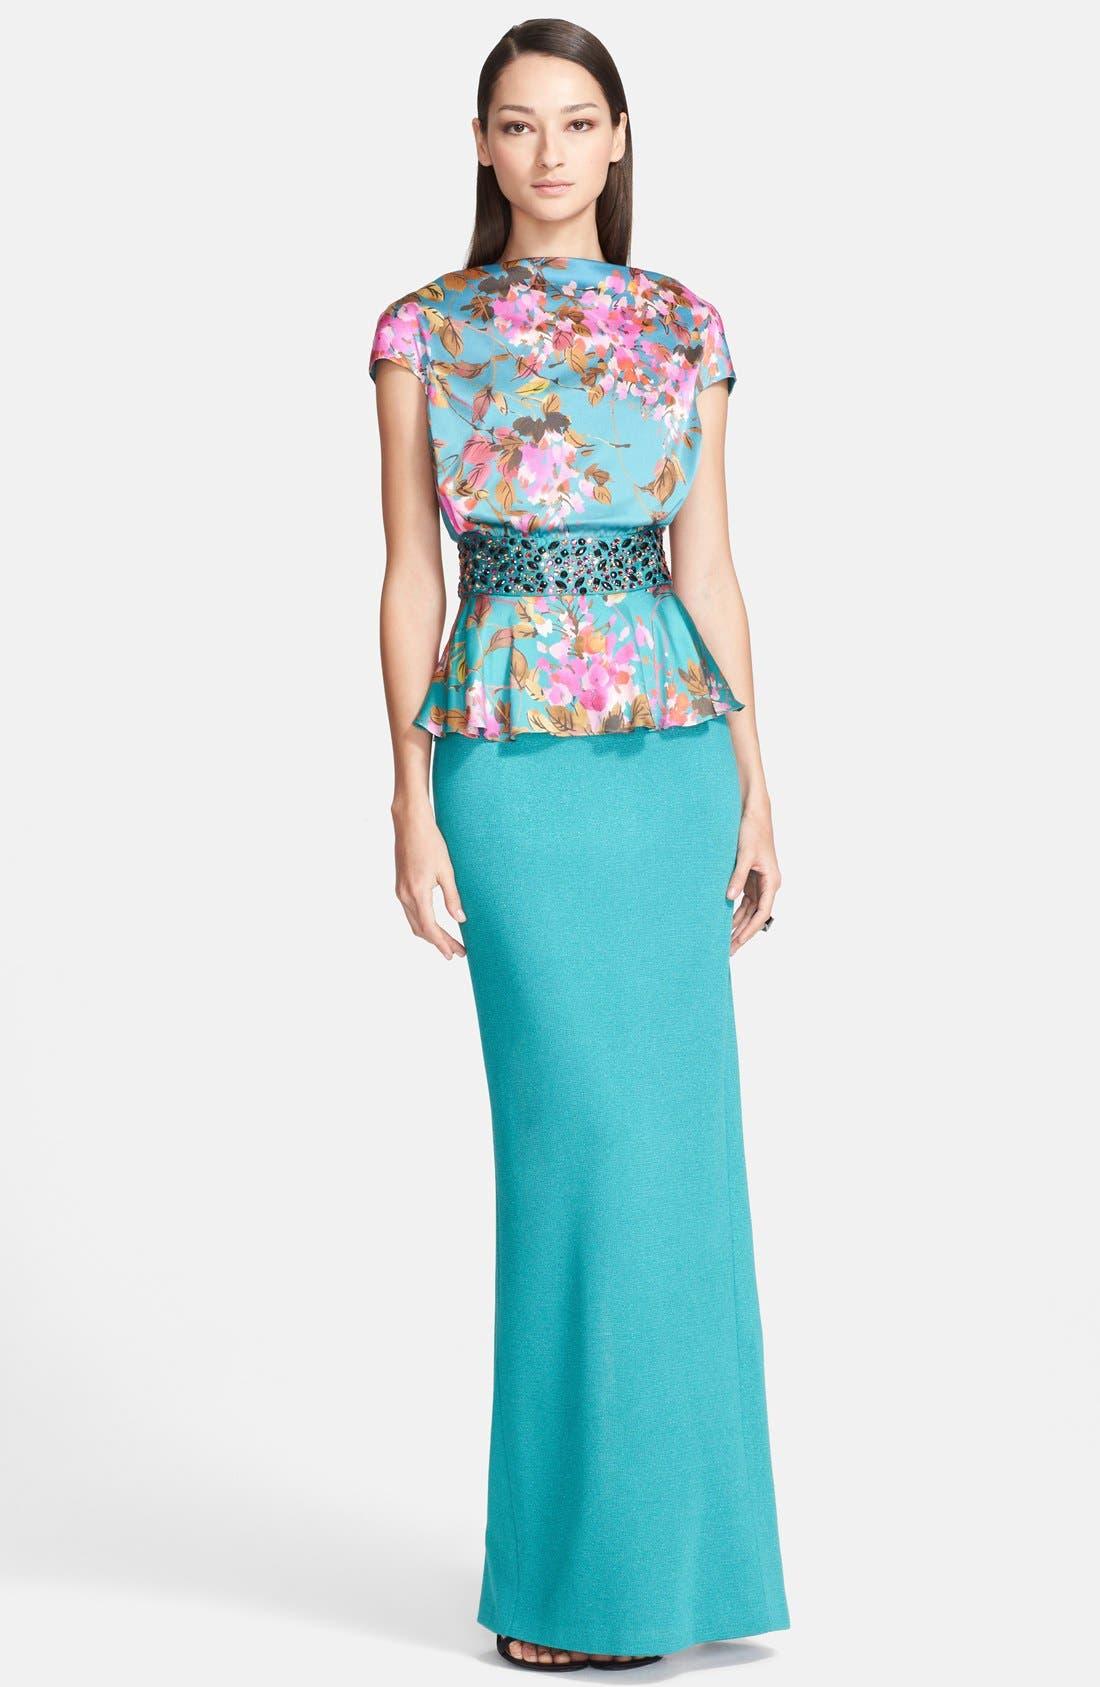 Alternate Image 1 Selected - St. John Collection Botanical Dégradé Print Charmeuse & Shimmer Milano Knit Gown